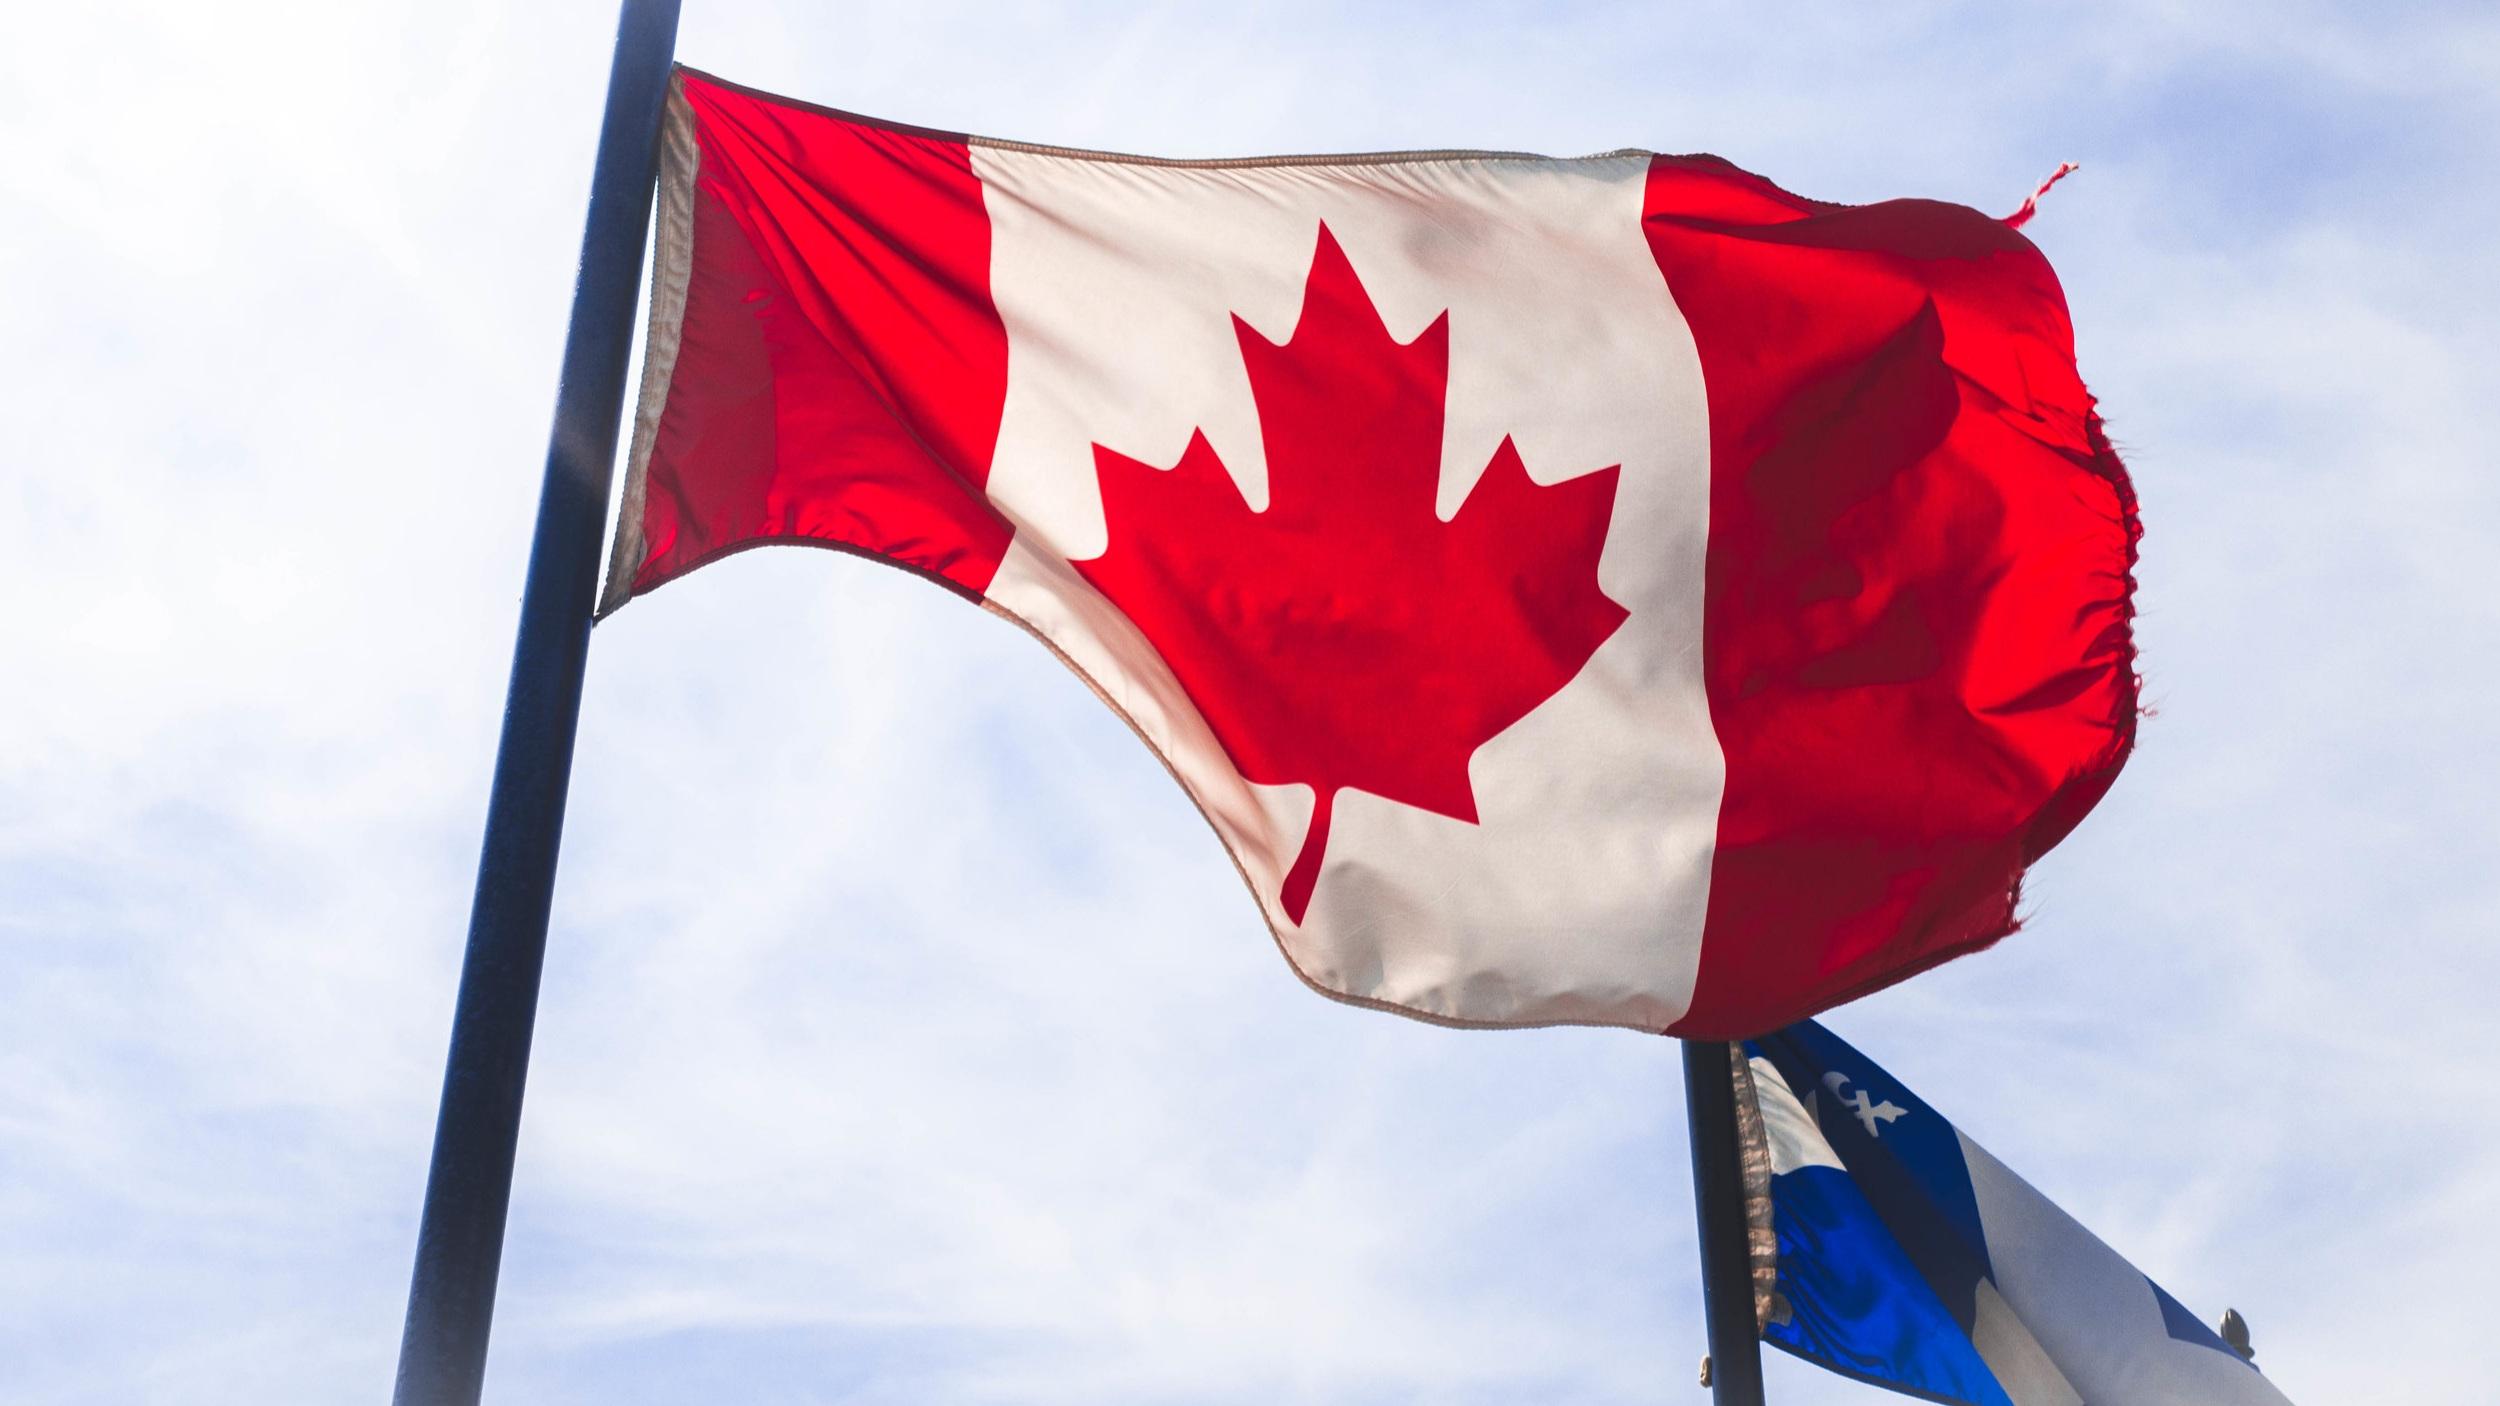 #1 - Legalized cannabis in Canada